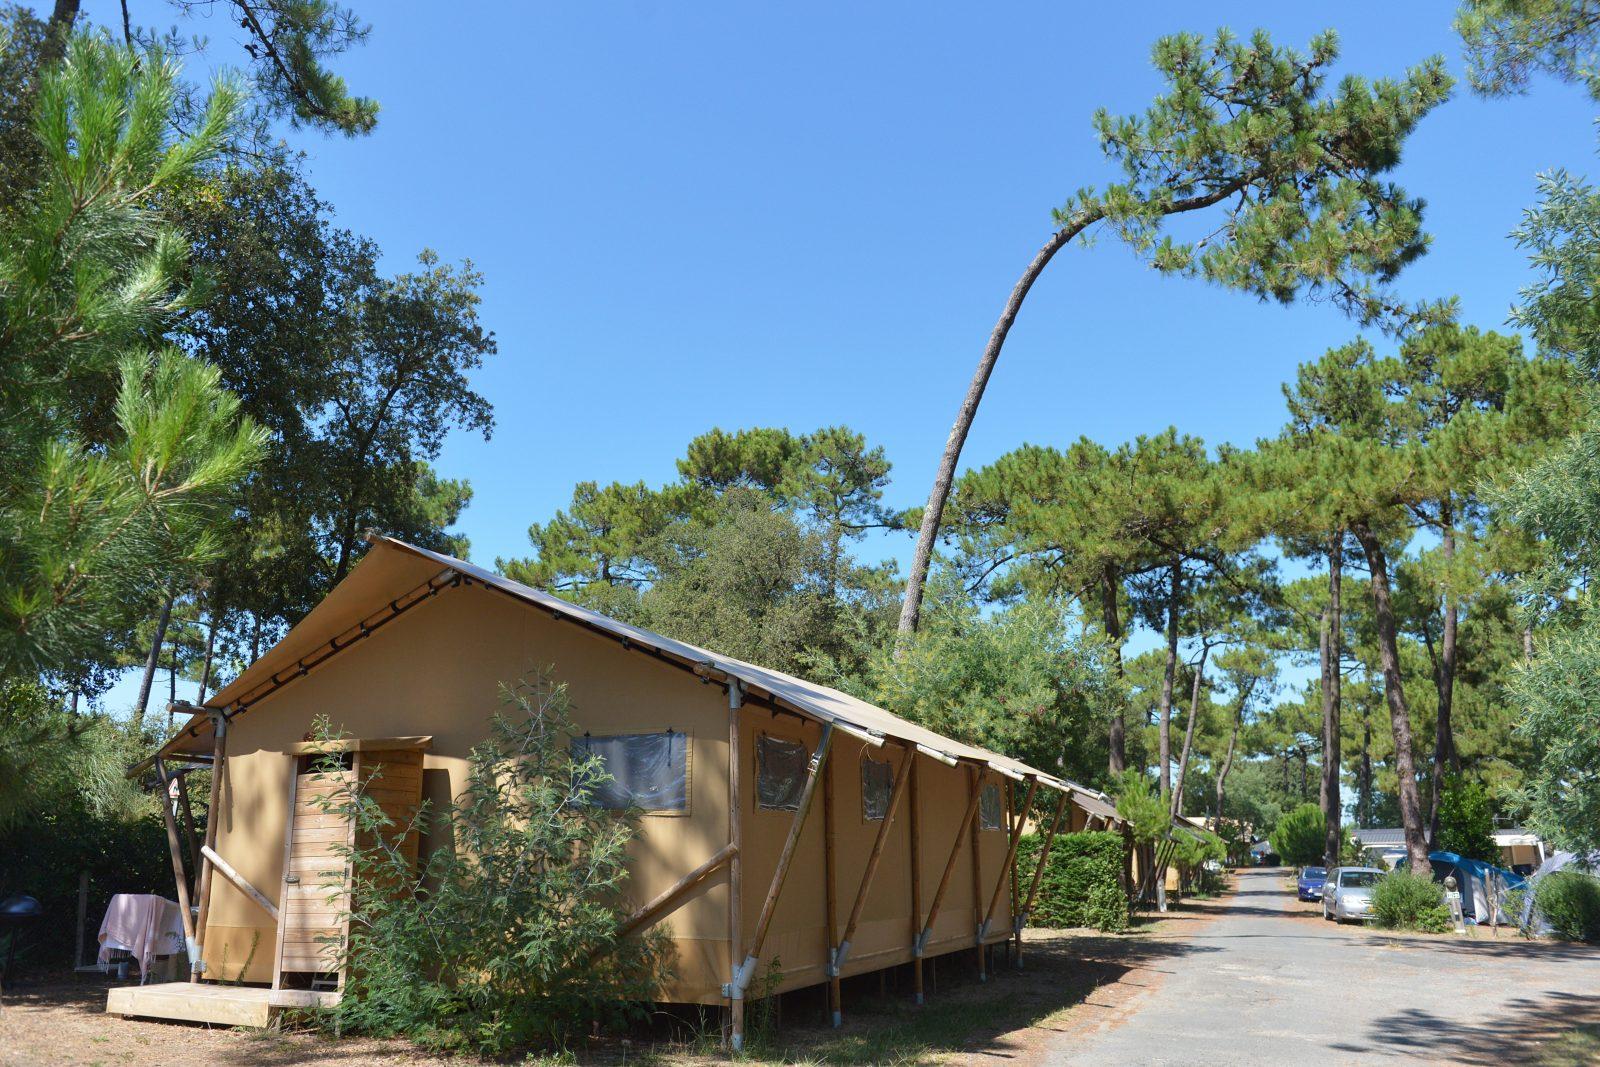 Camping_Les_Pins_31_HD_©X.Renaudin_DSC_5994